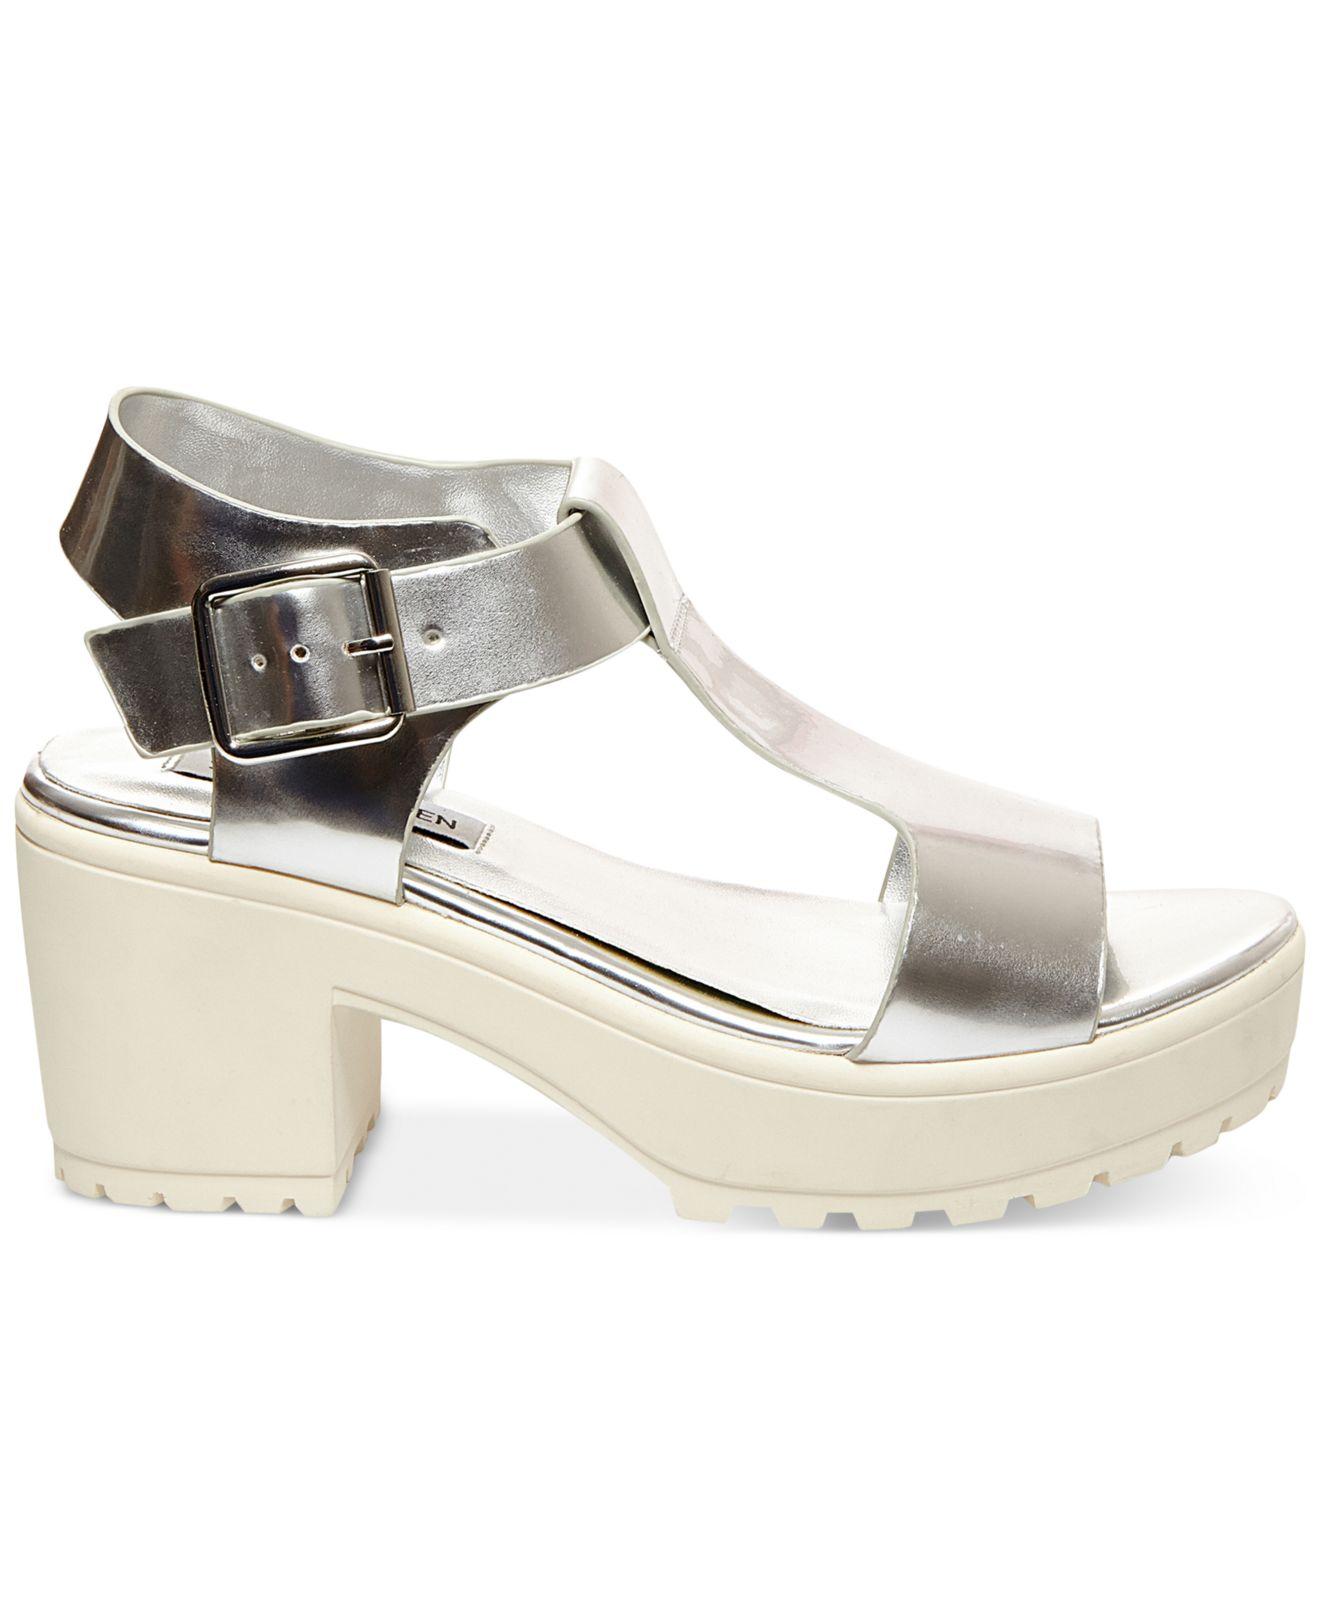 02b9afac2ab Lyst Heel In Platform Stefano Madden Women s Sandals Steve Block rqSrxwOX